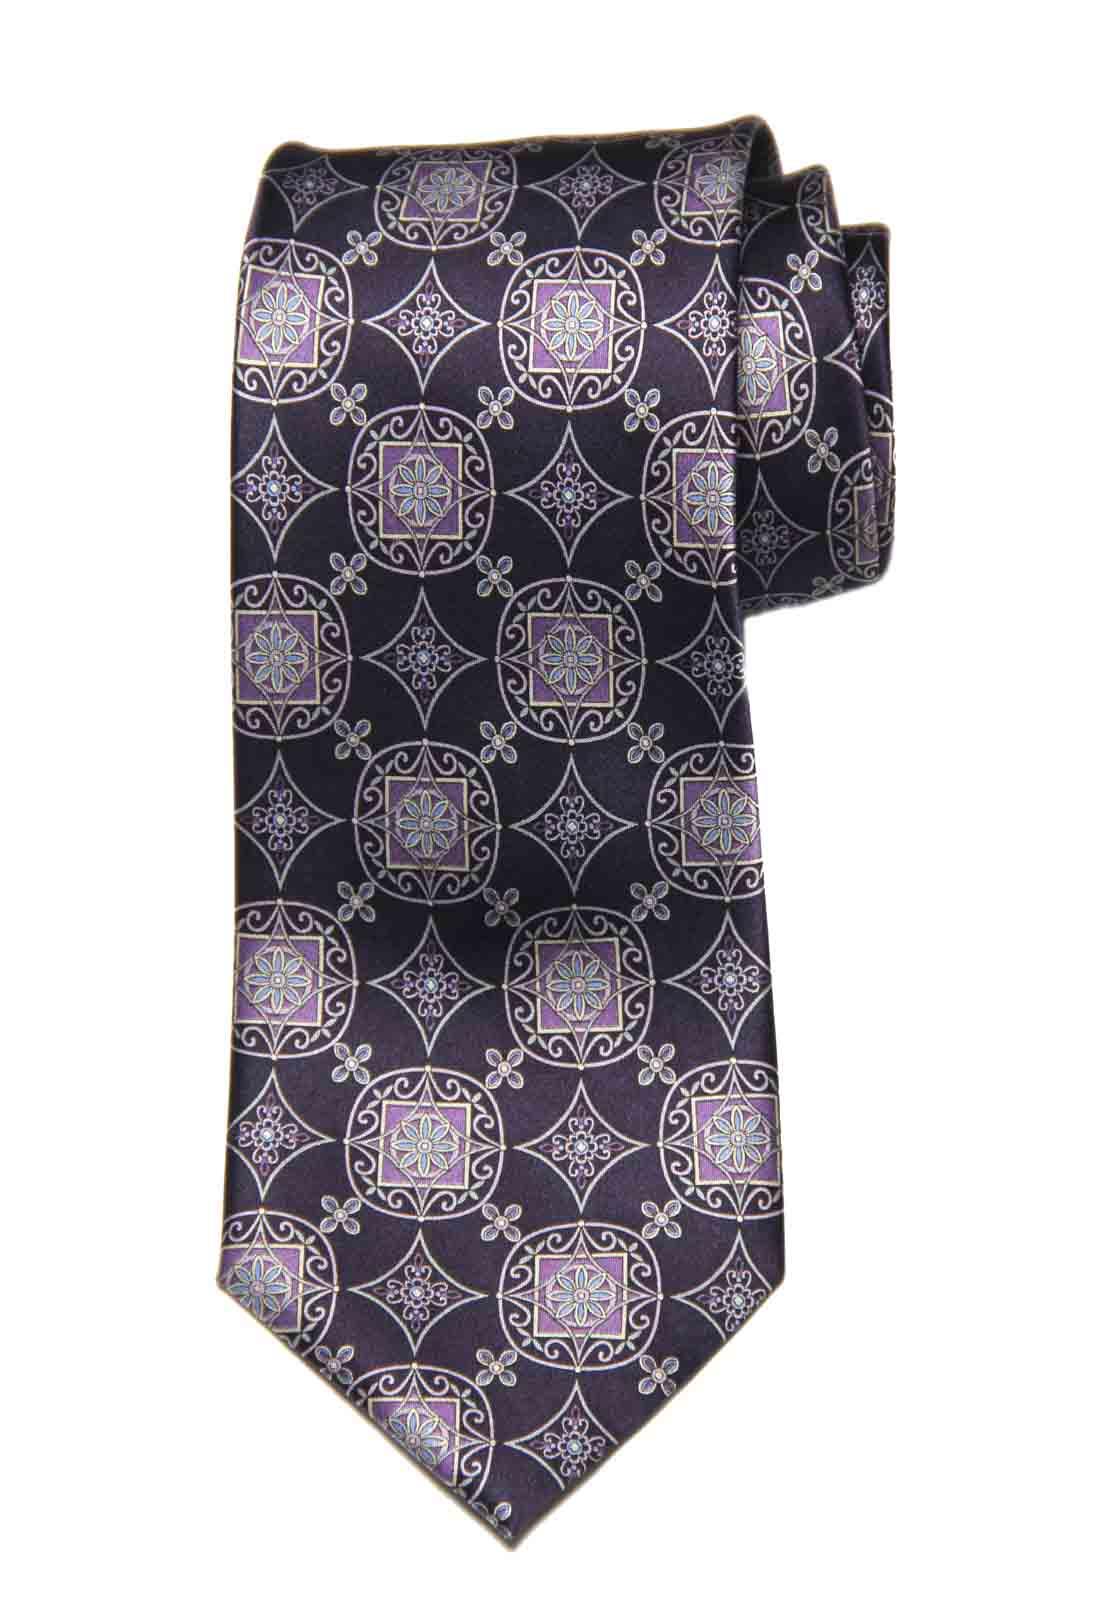 Joseph Feiss Silk Tie Floral Purple Gray Blue Men's